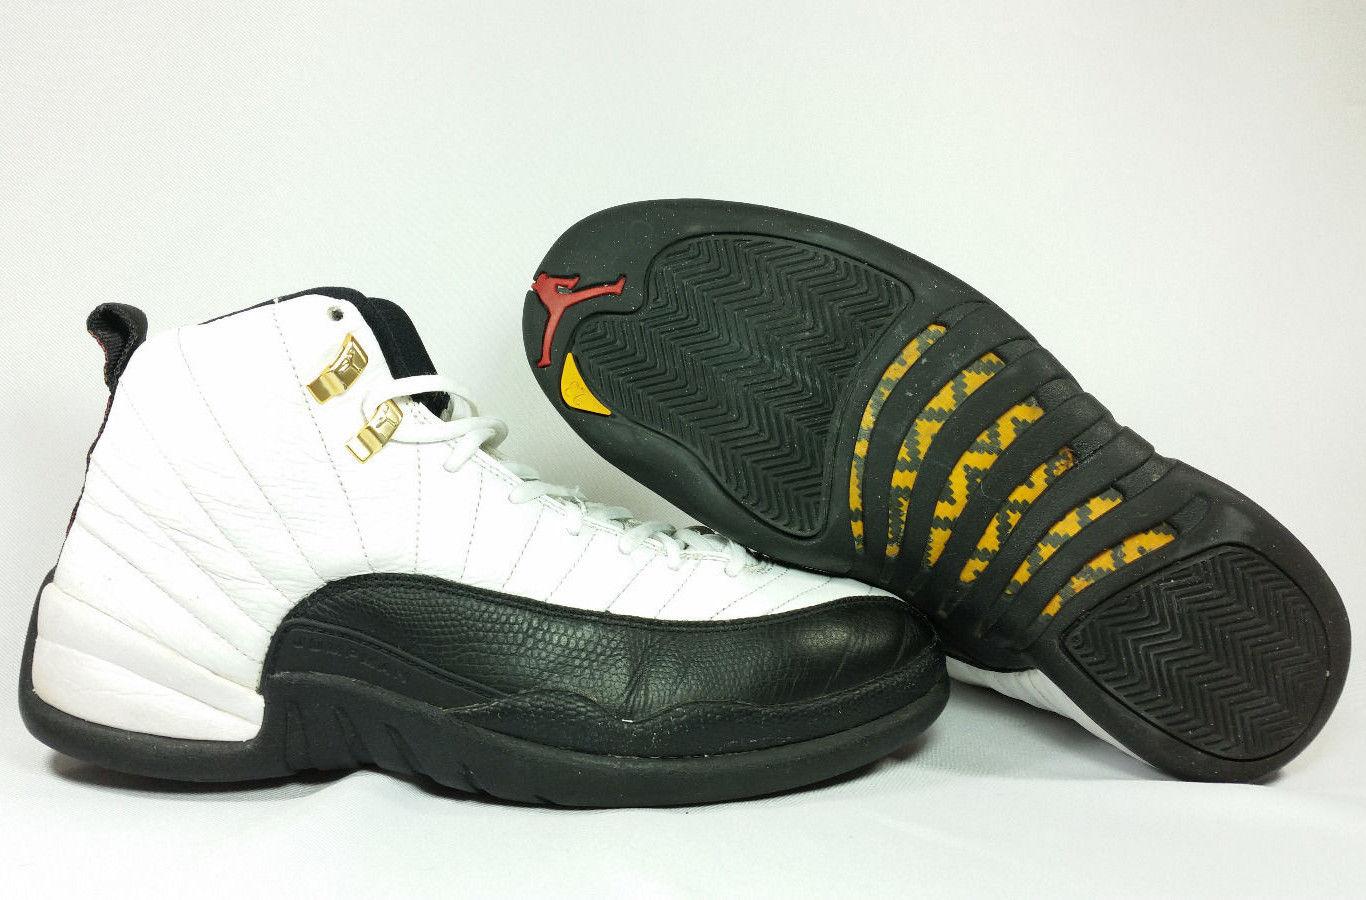 promo code 46c70 15158 Nike Air Jordan XII 12 Retro CDP COUNTDOWN WHITE BLACK TAXI GOLD 130690-109  11.5